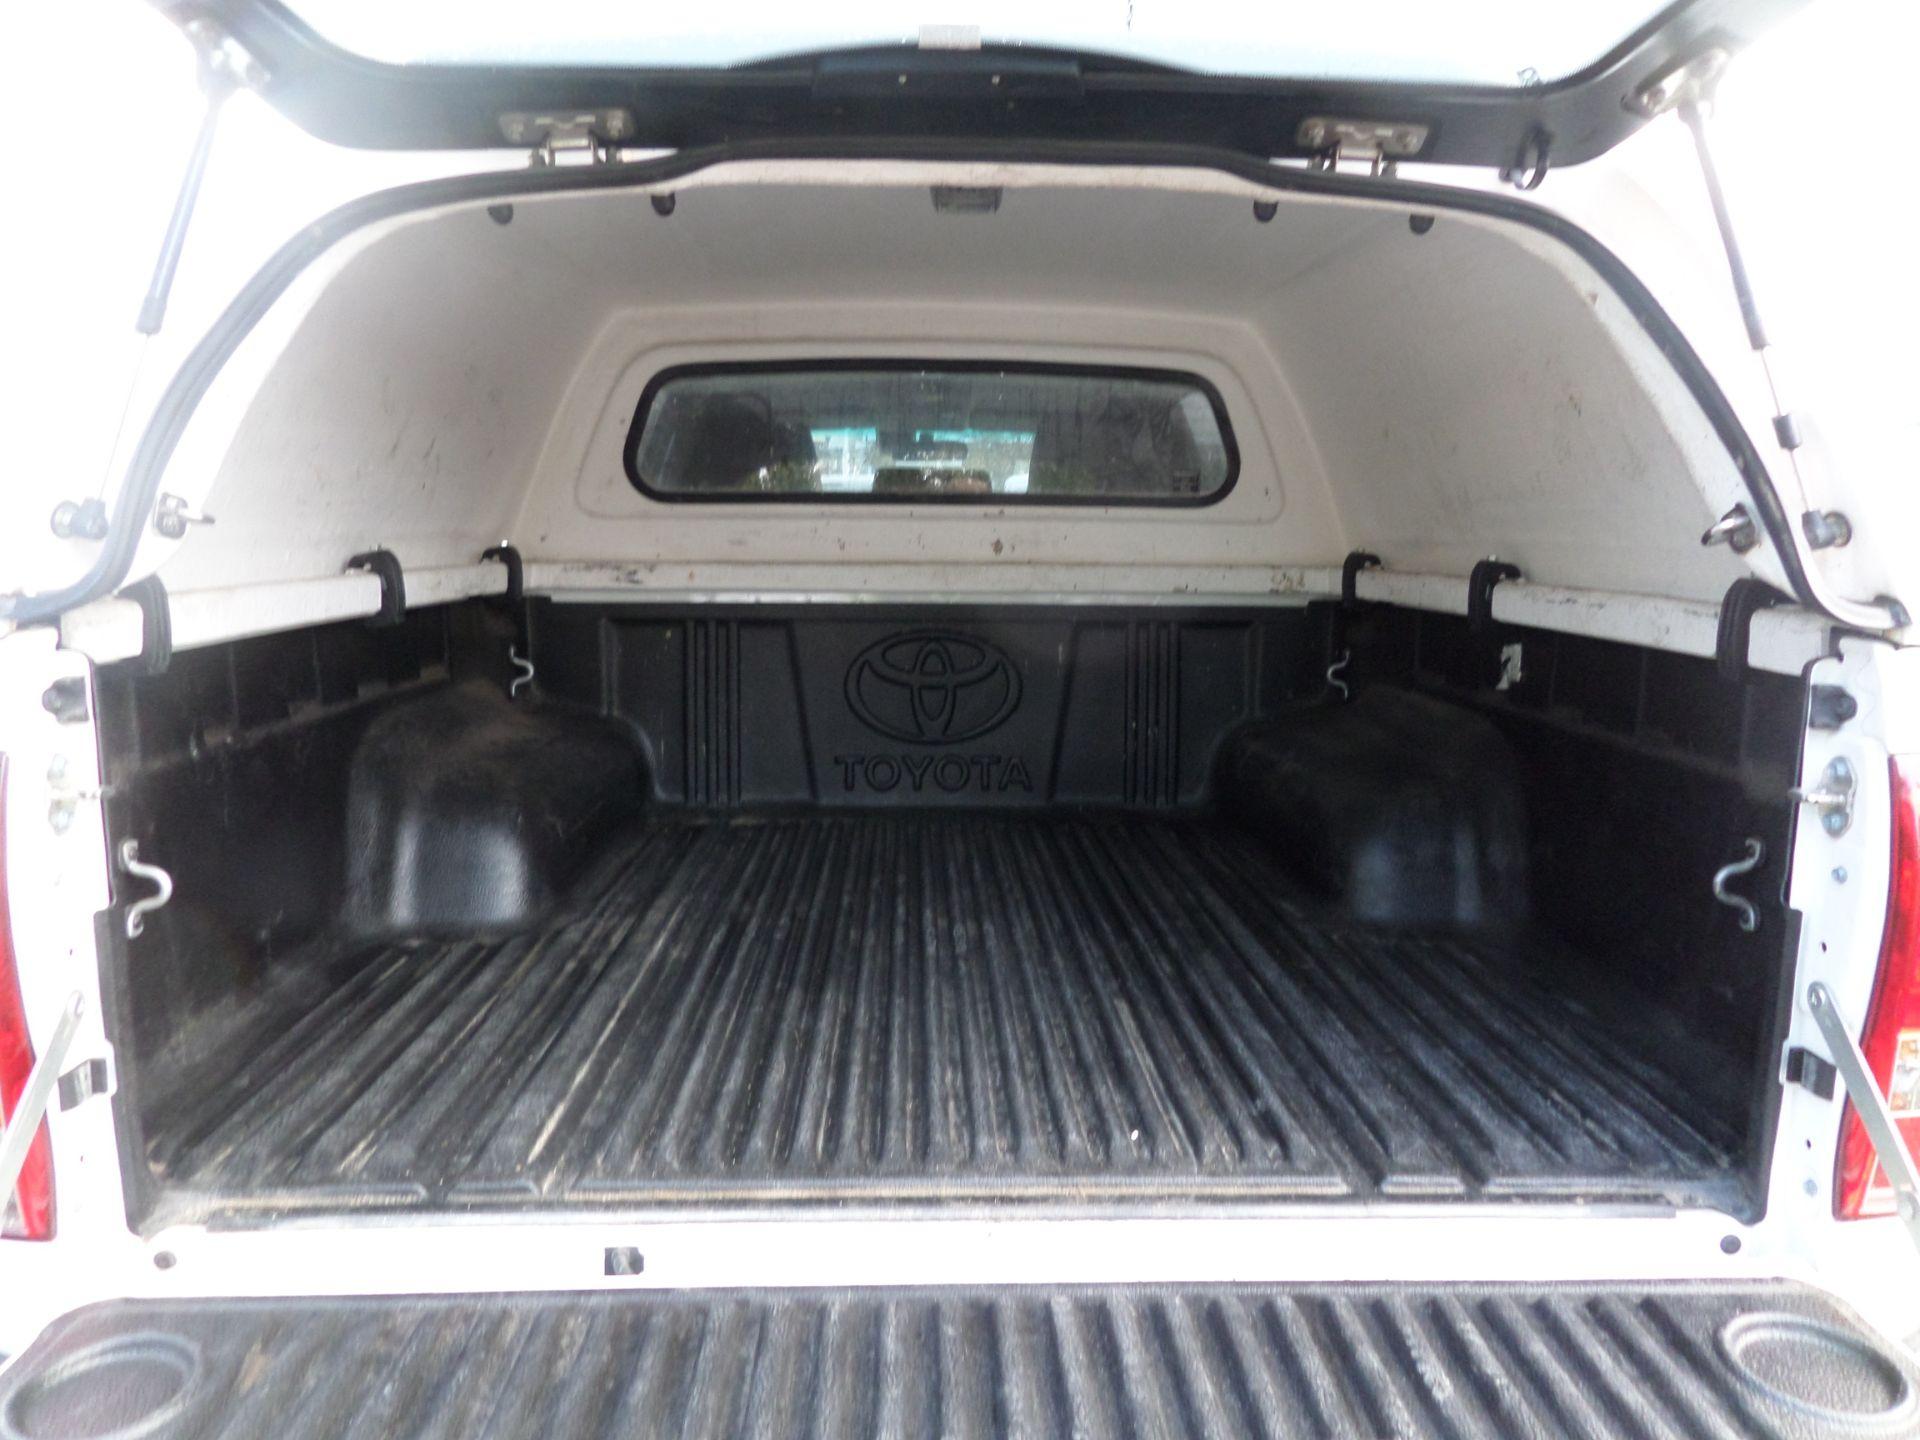 2017 Toyota Hilux Invincible D/Cab Pick Up 2.4 D-4D Euro 6 (NU67OHD) Image 5